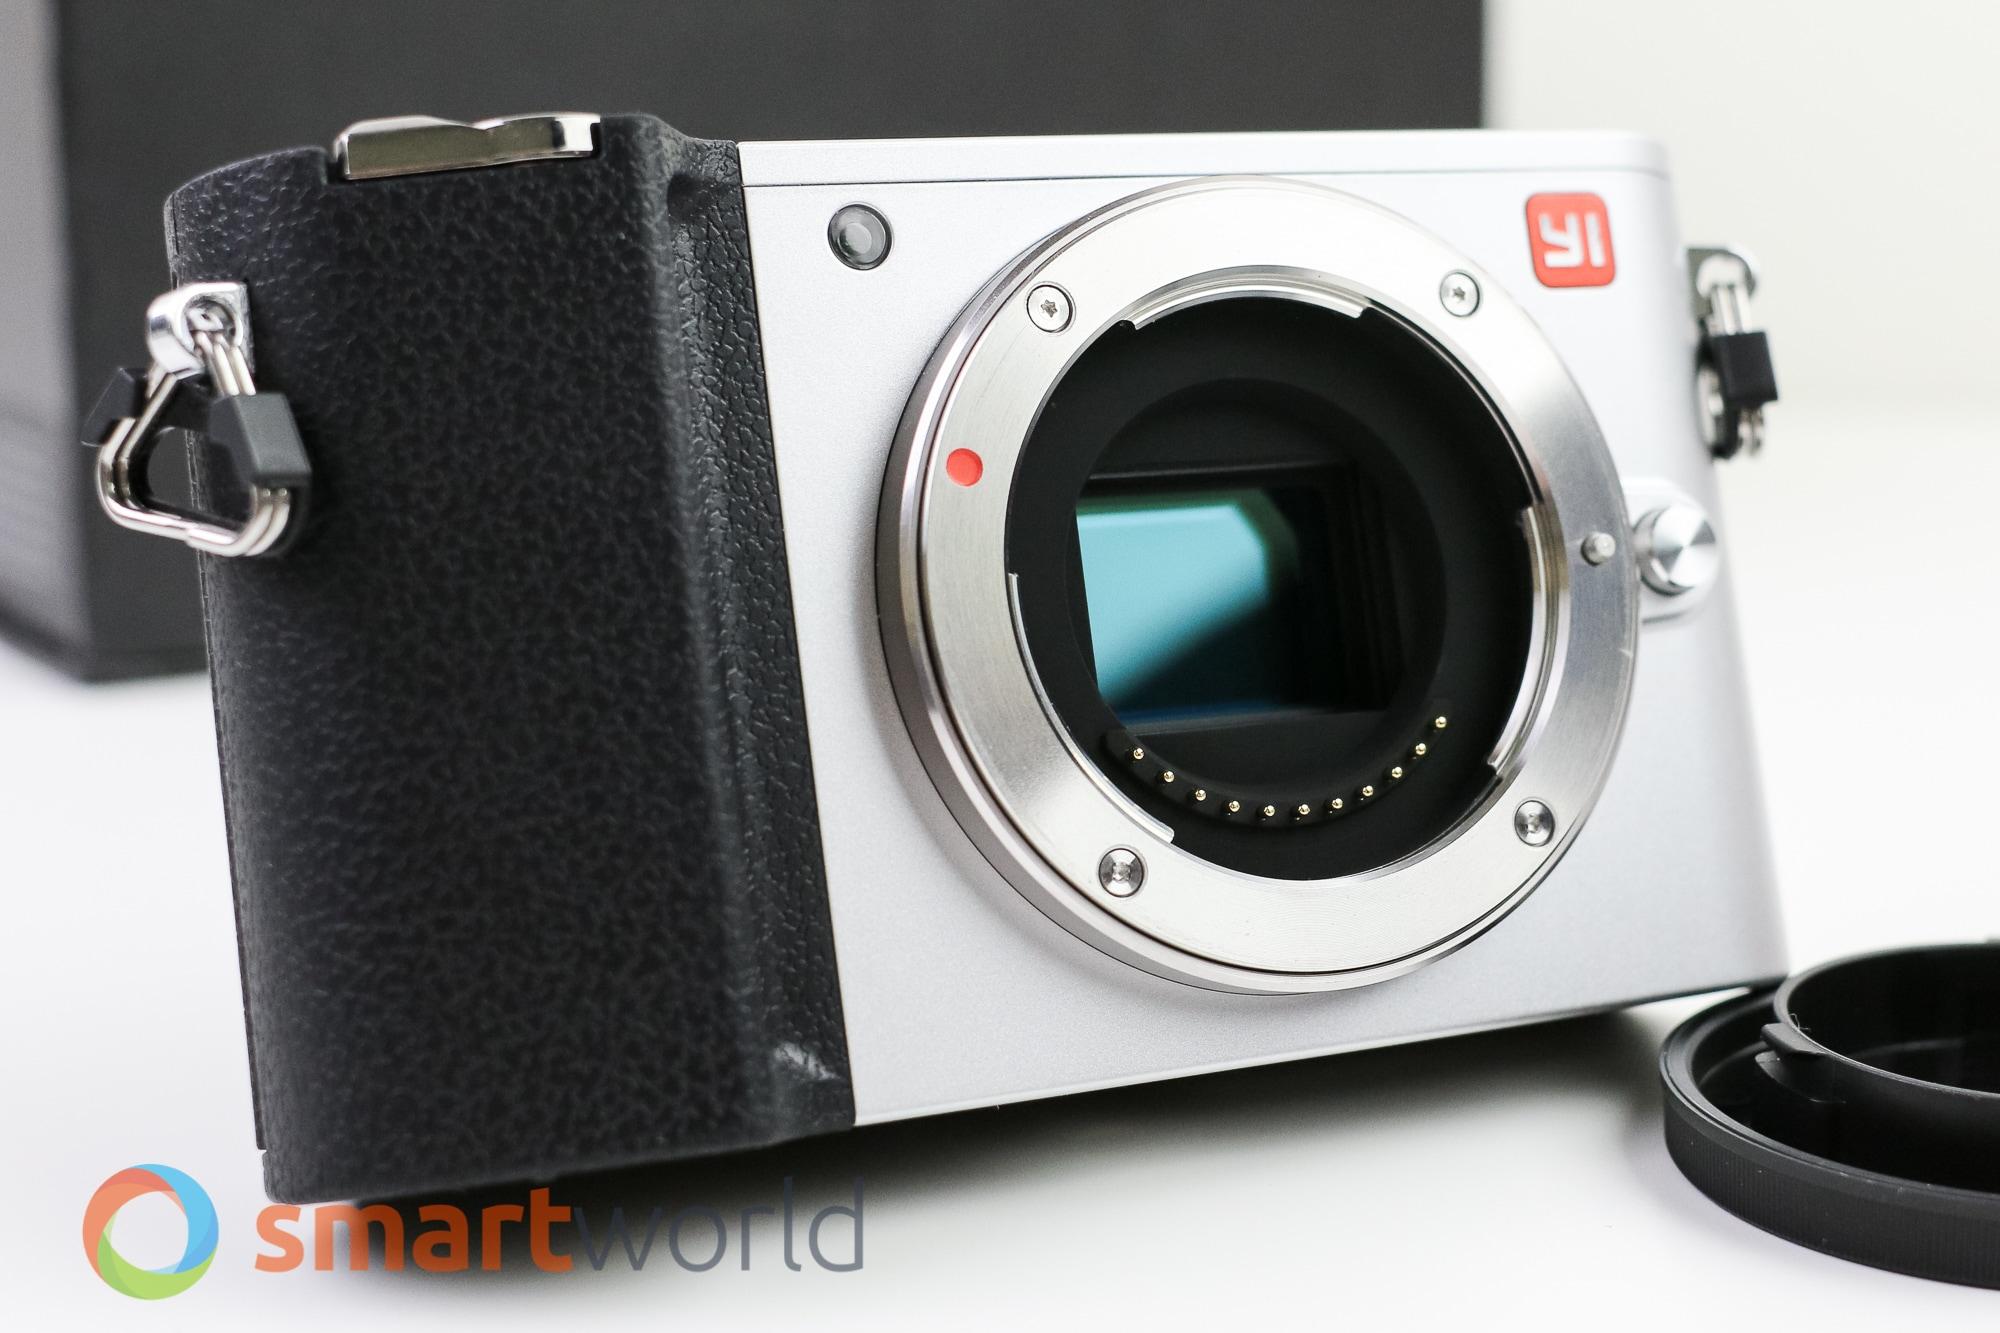 Recensione xiaomi yi m1 mirrorless qualit foto for Microfono esterno xiaomi yi